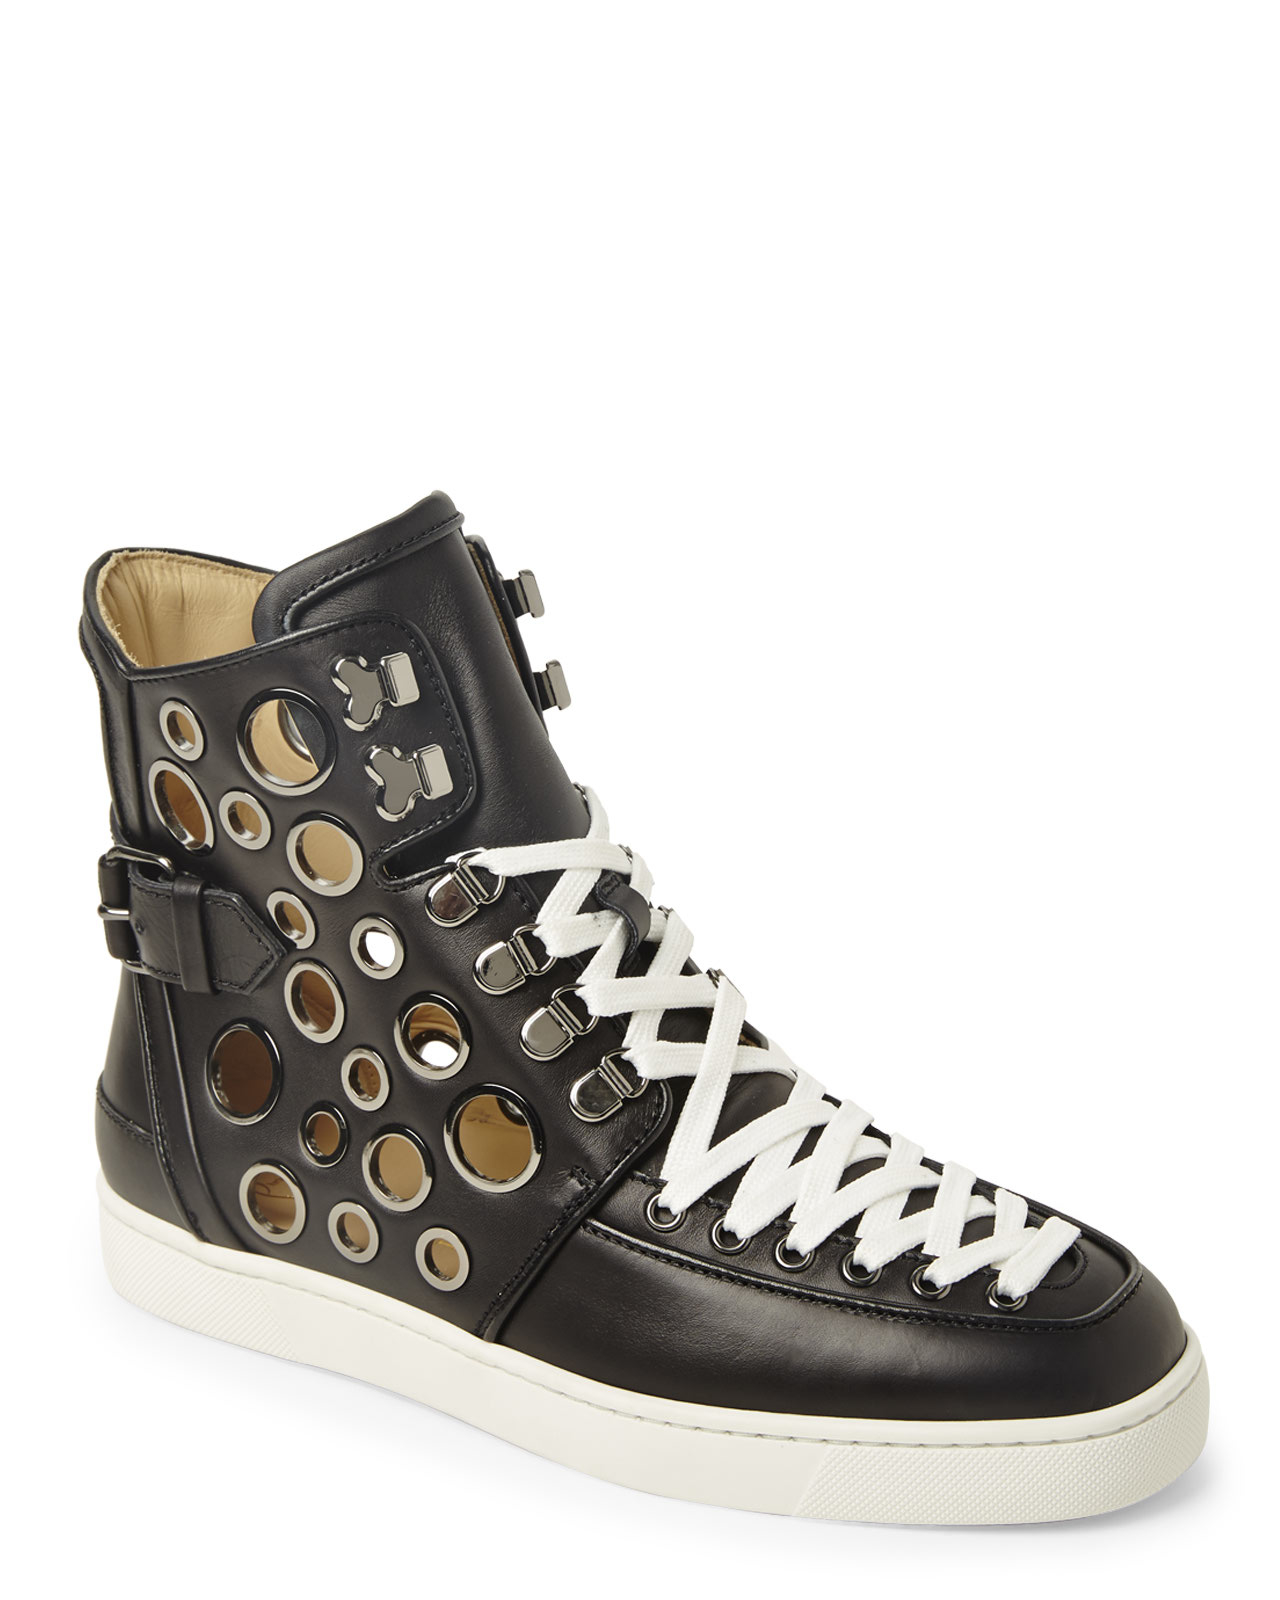 louboutin amsterdam sneakers